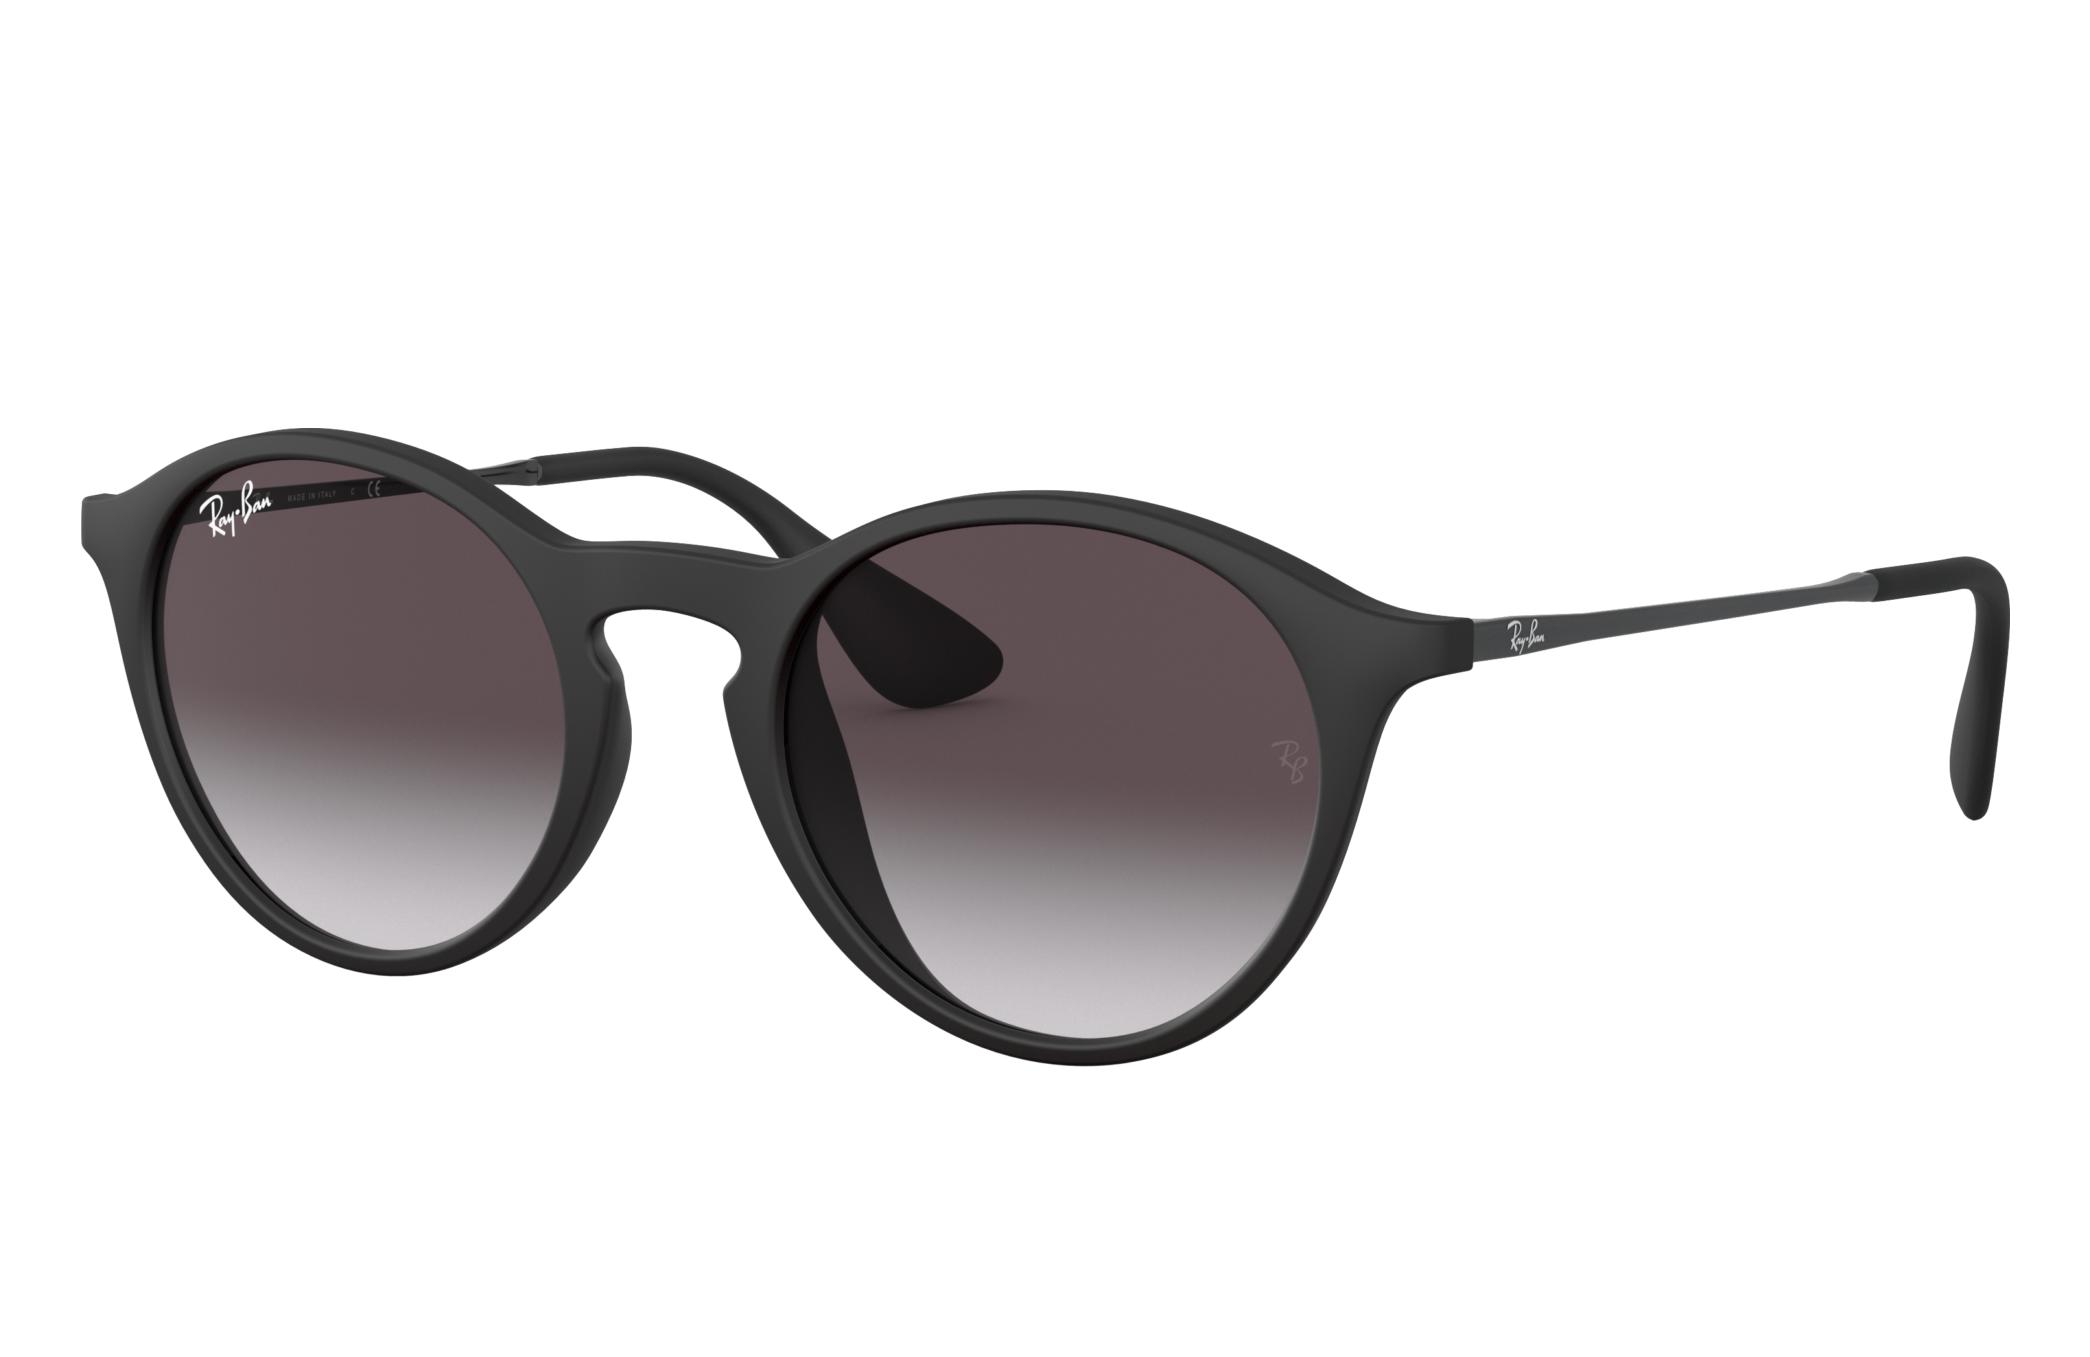 Ray-Ban Rb4243 Black, Gray Lenses - RB4243